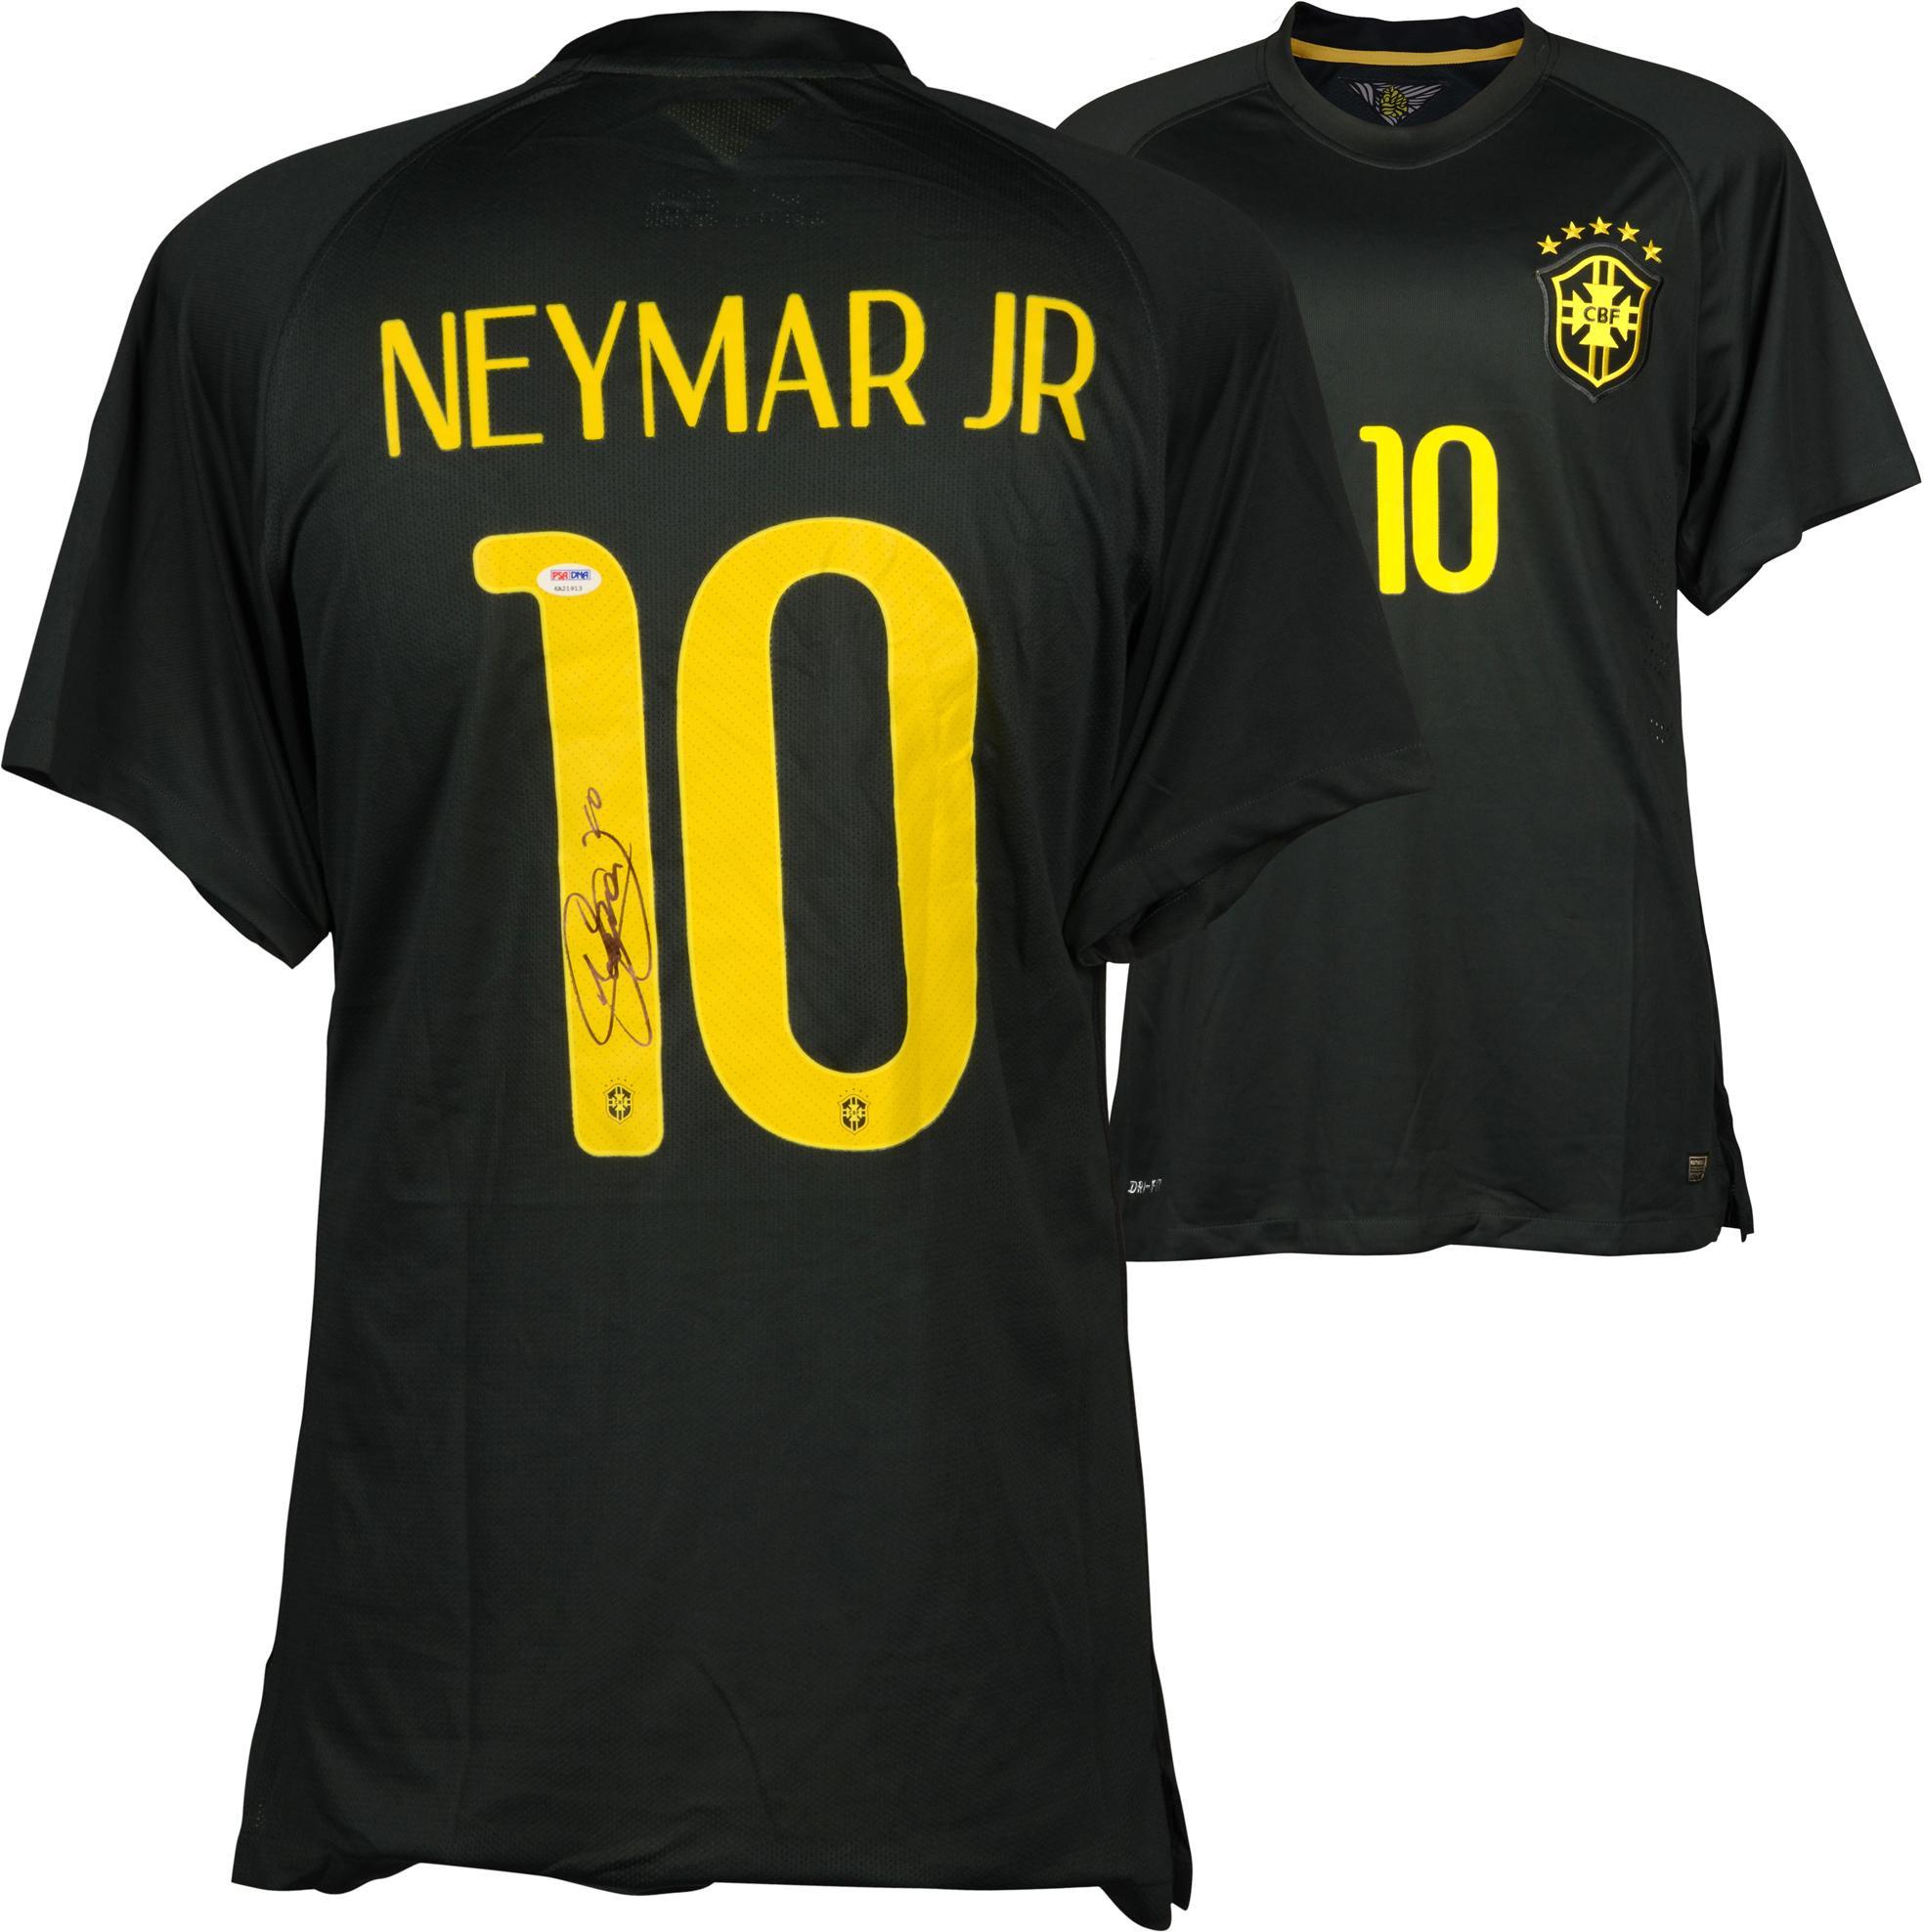 Neymar Santos Brazil National Team Autographed Black Jersey